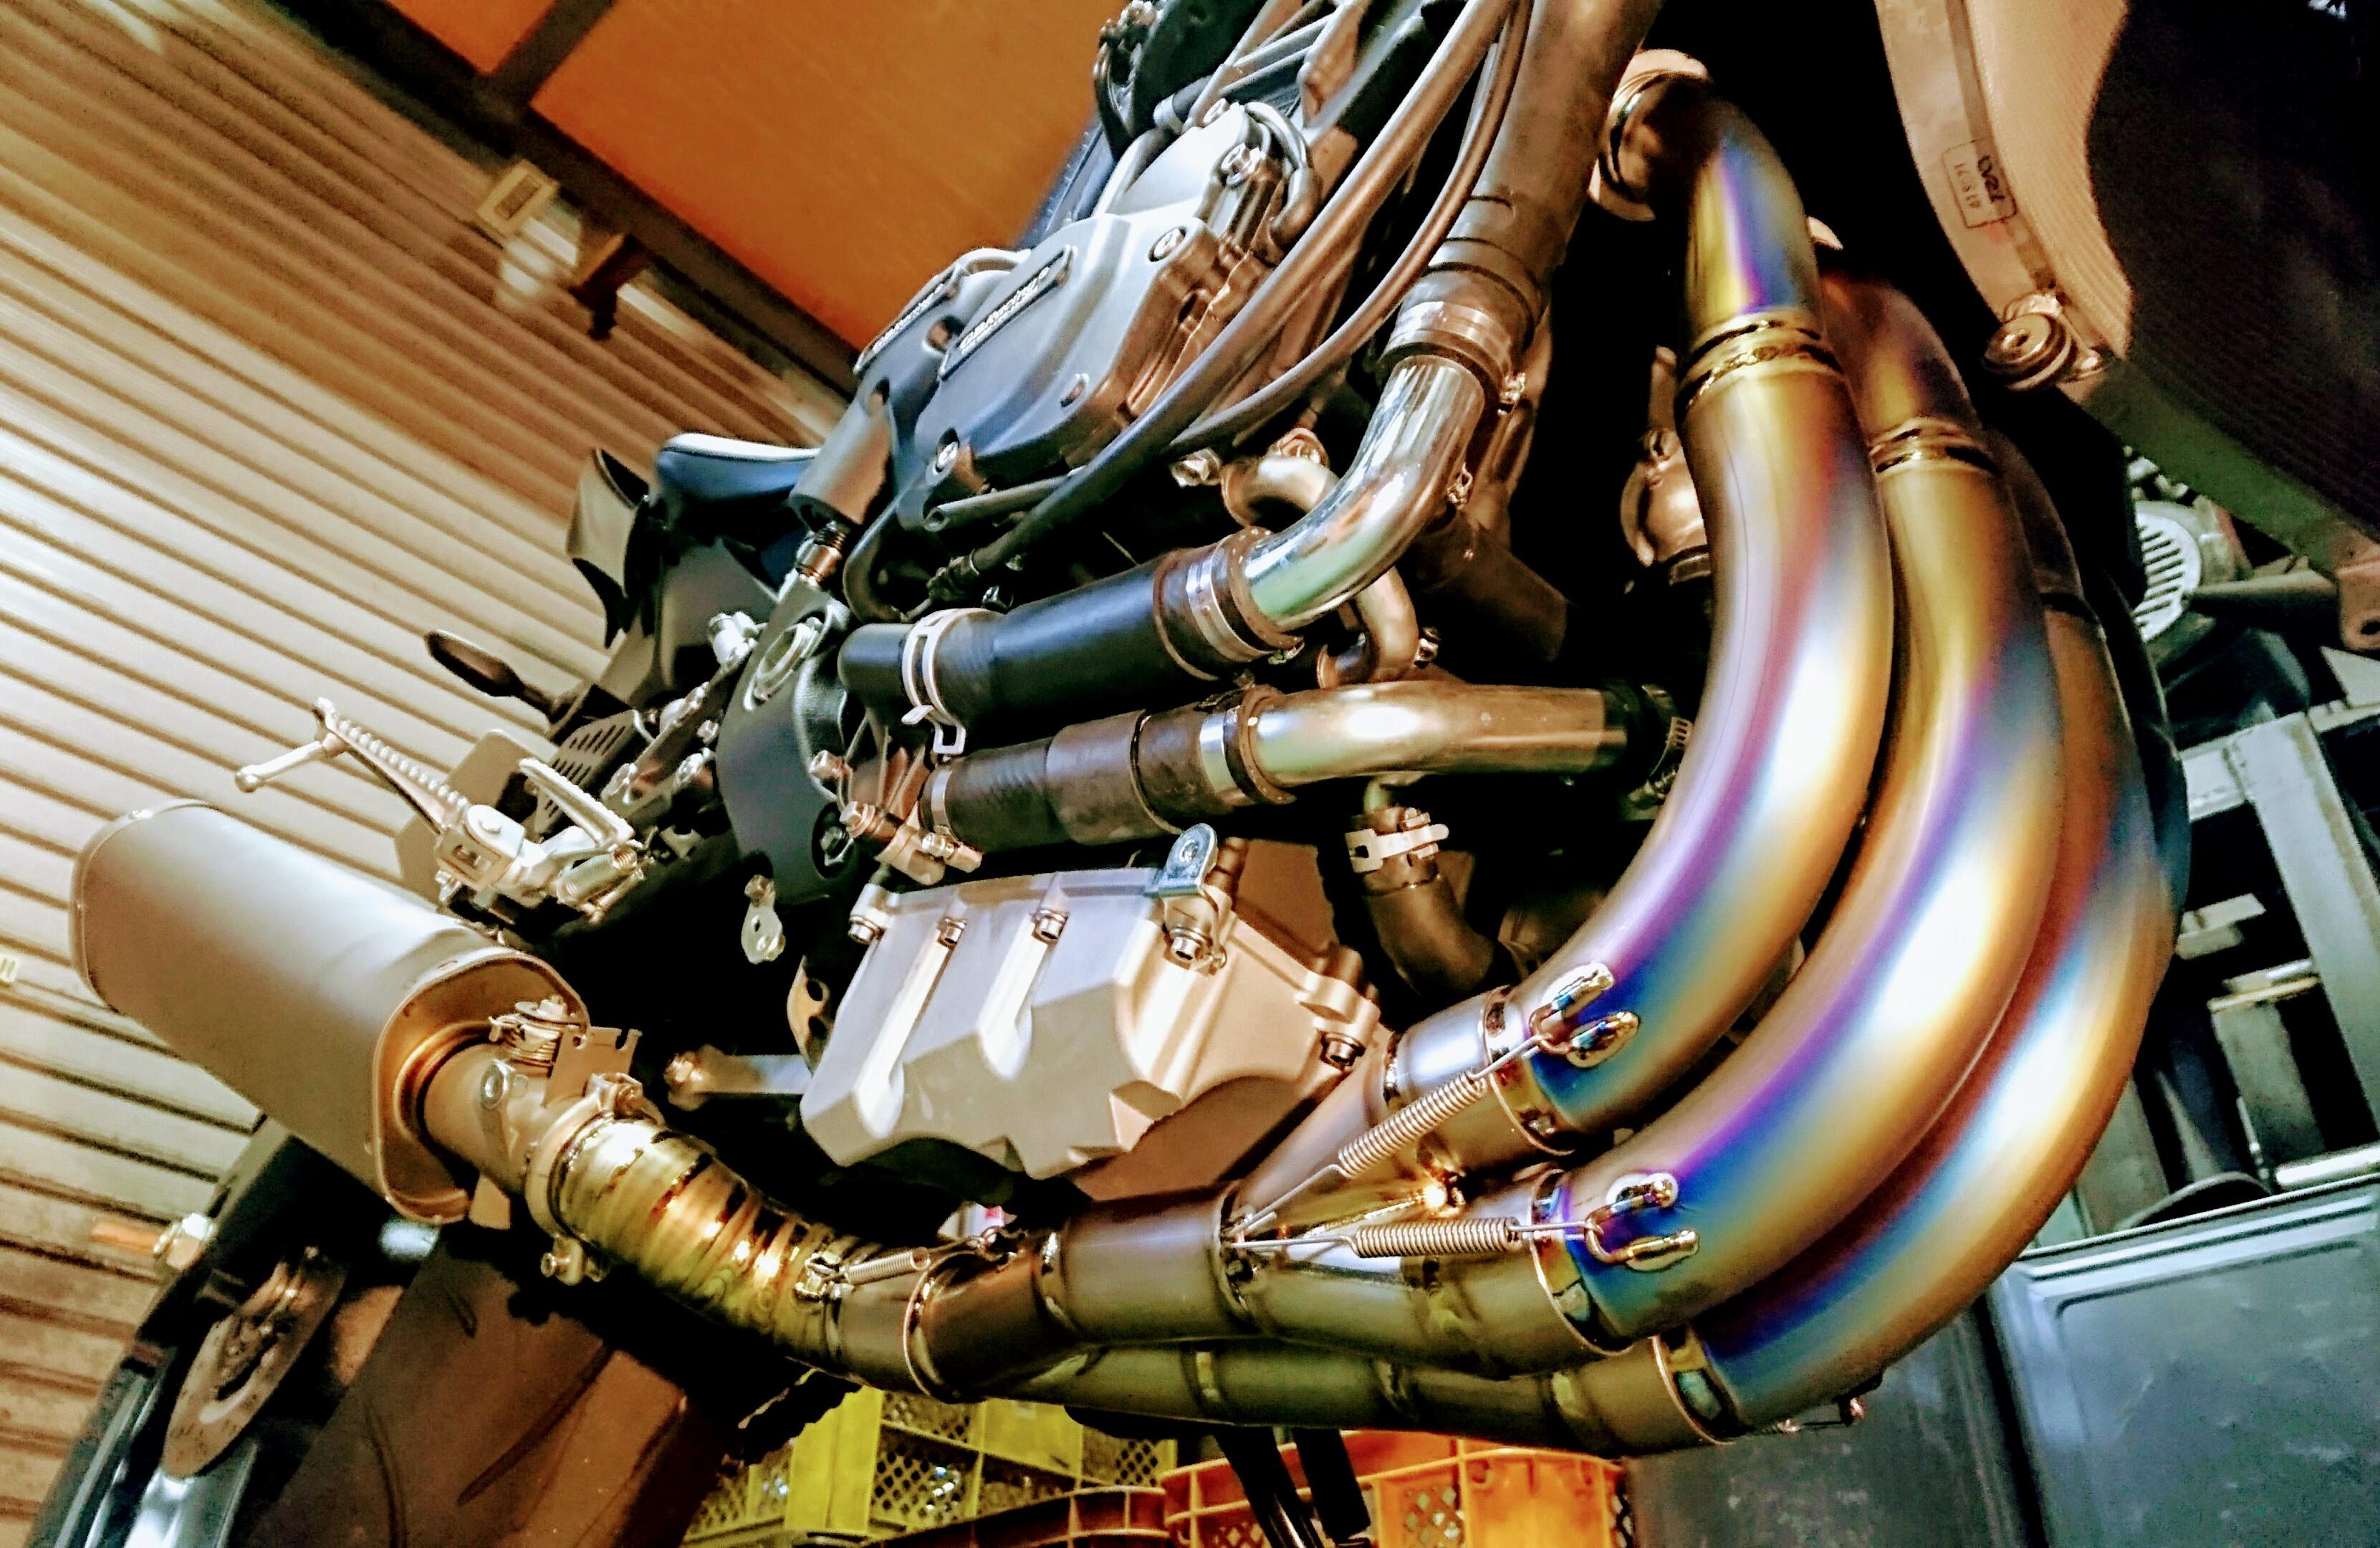 '17-YZF-R6 フルチタン ストレートヘッダーパイプ